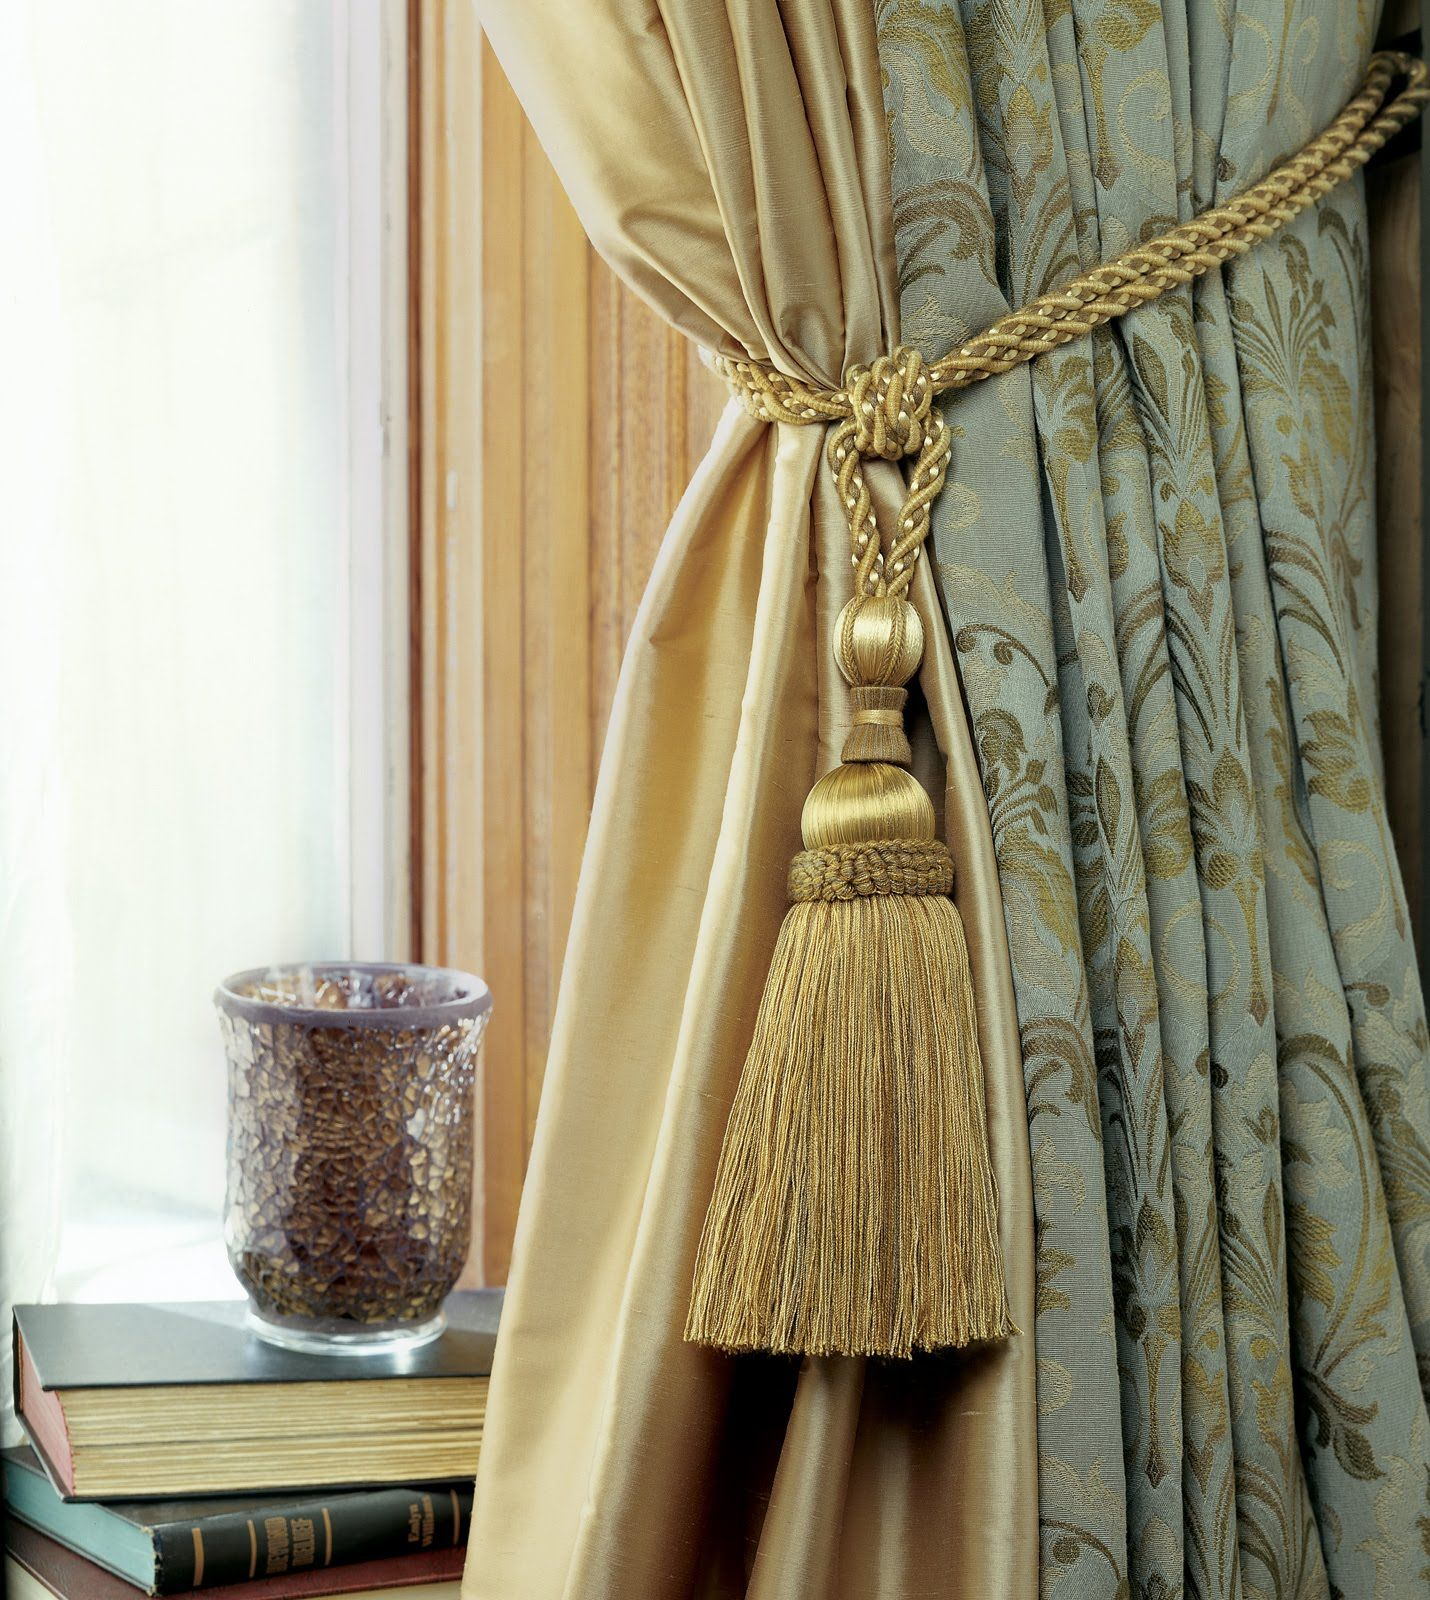 How To Tie A Curtain Tieback Having Tassels Podhvaty Dlya